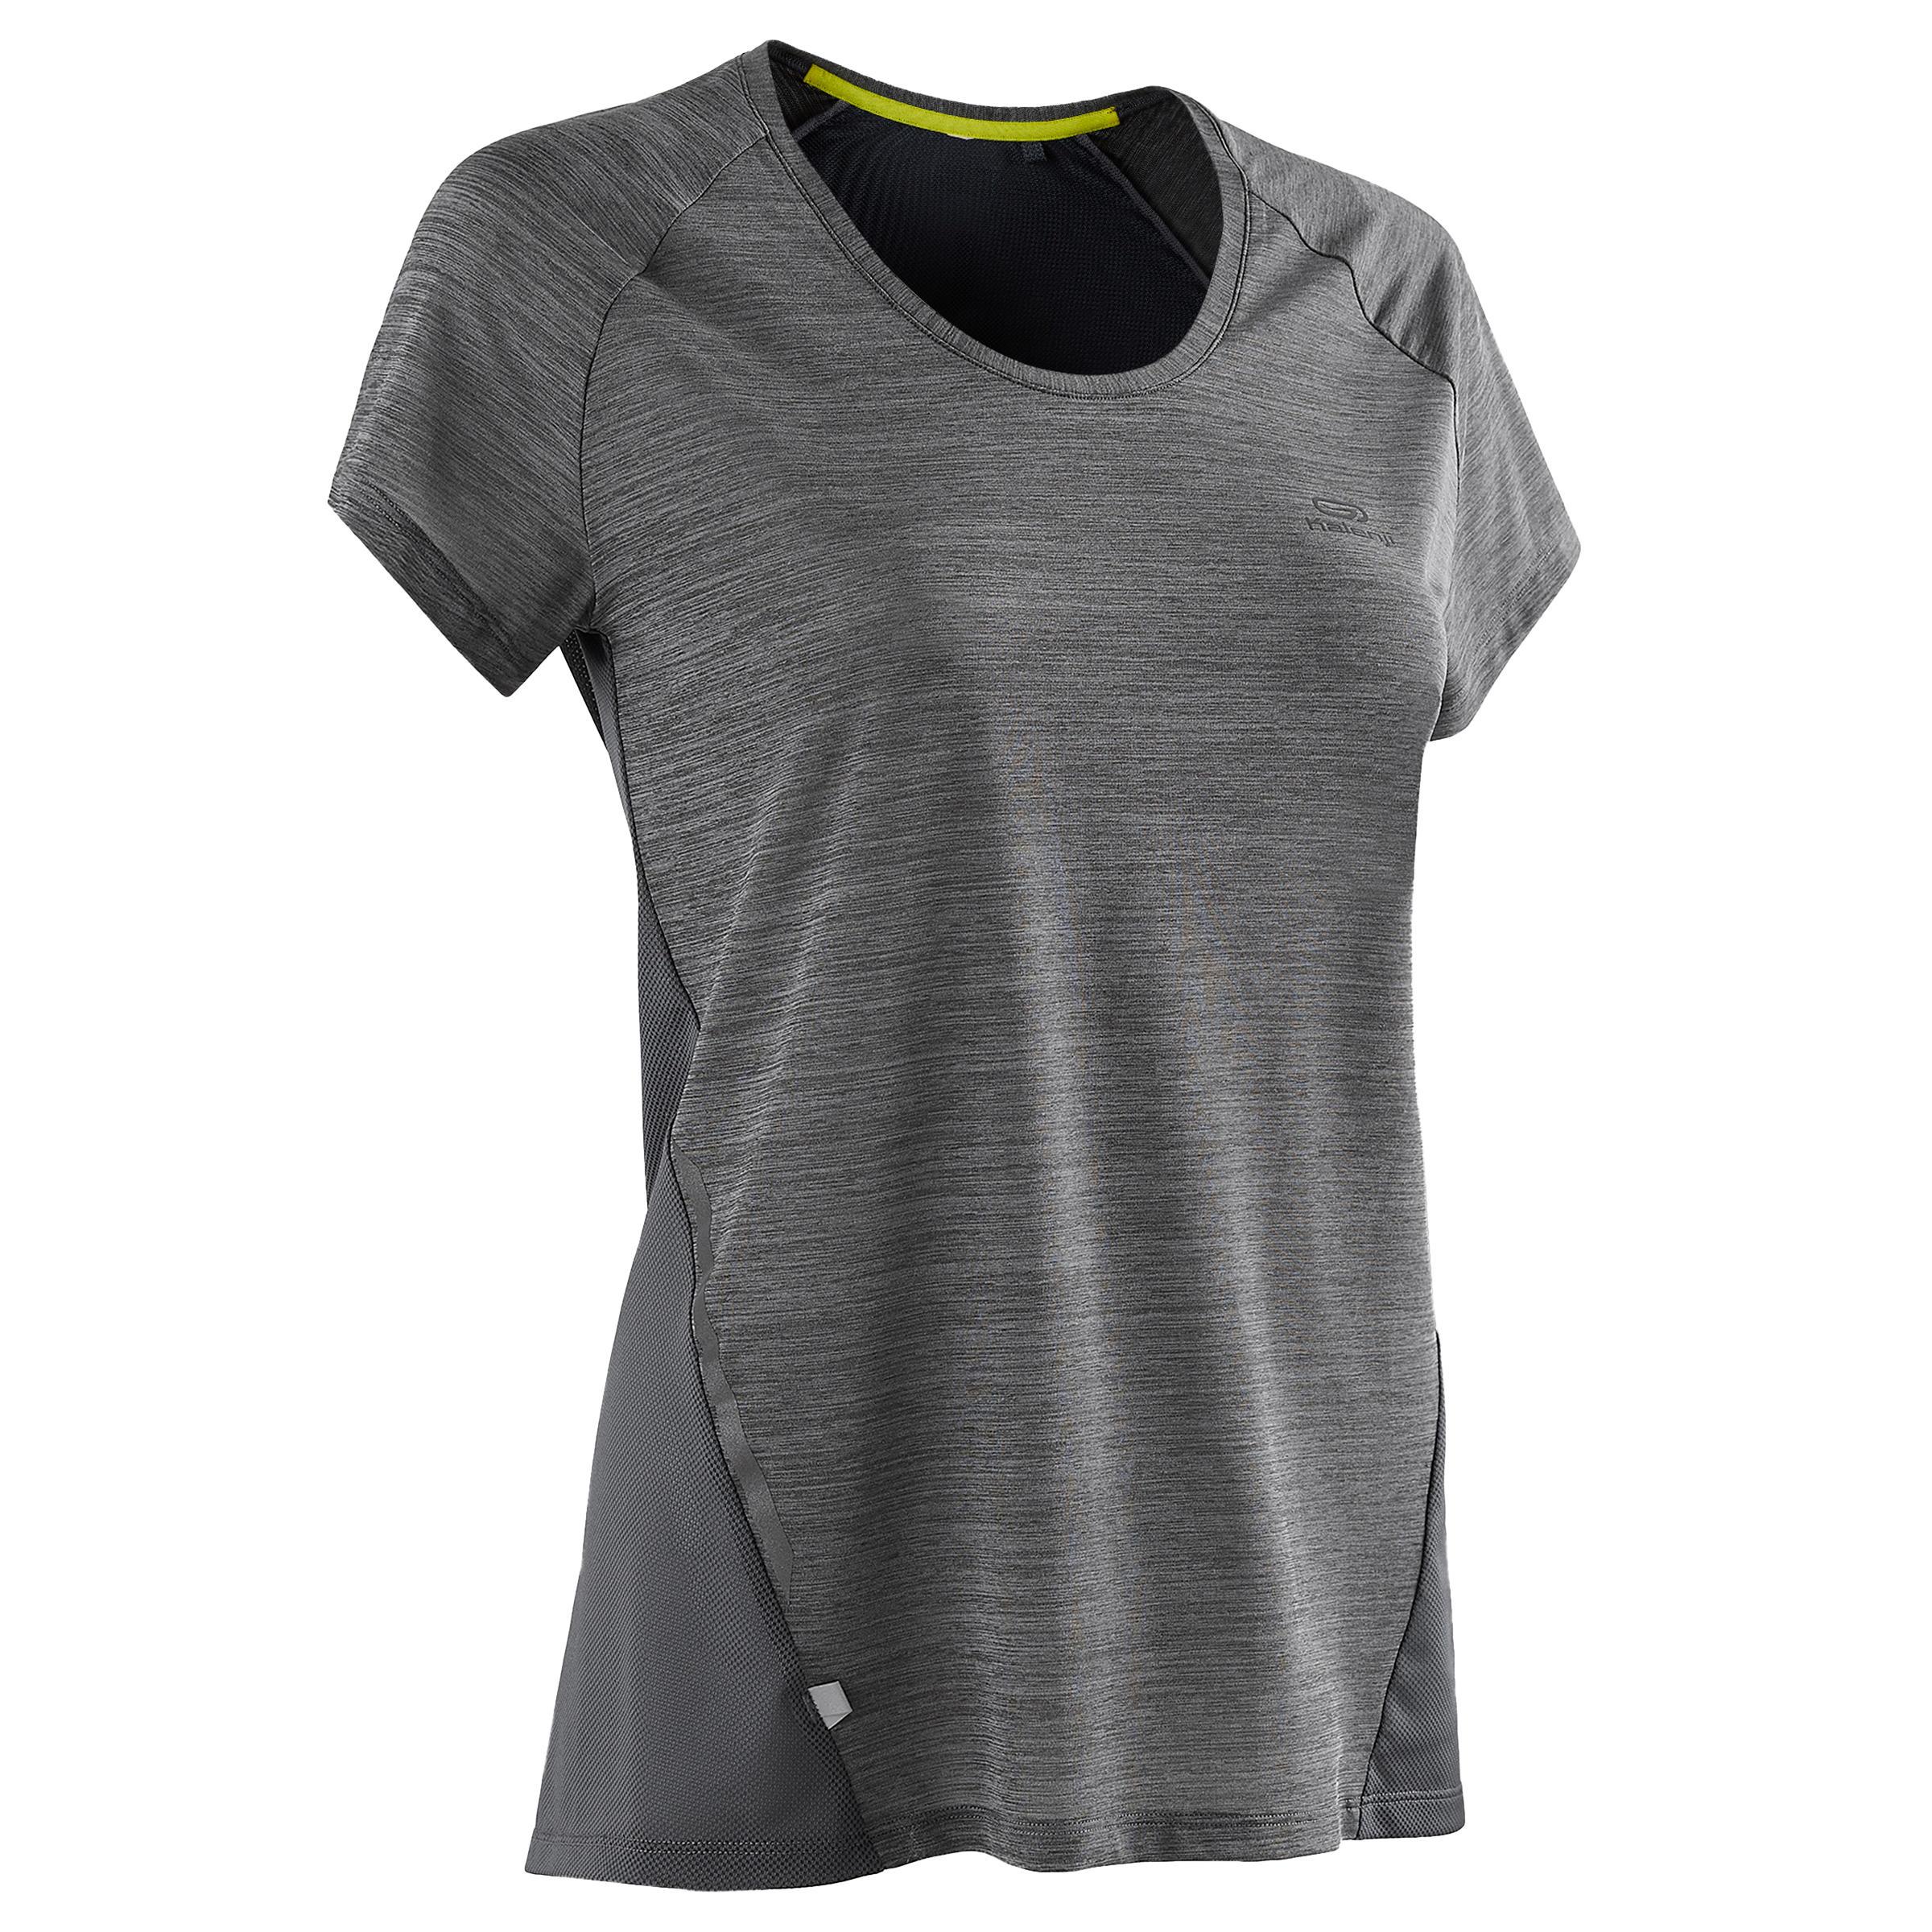 Laufshirt kurzarm Run Light Damen grau | Sportbekleidung > Sportshirts > Laufshirts | Grau - Blau - Gelb | Kalenji